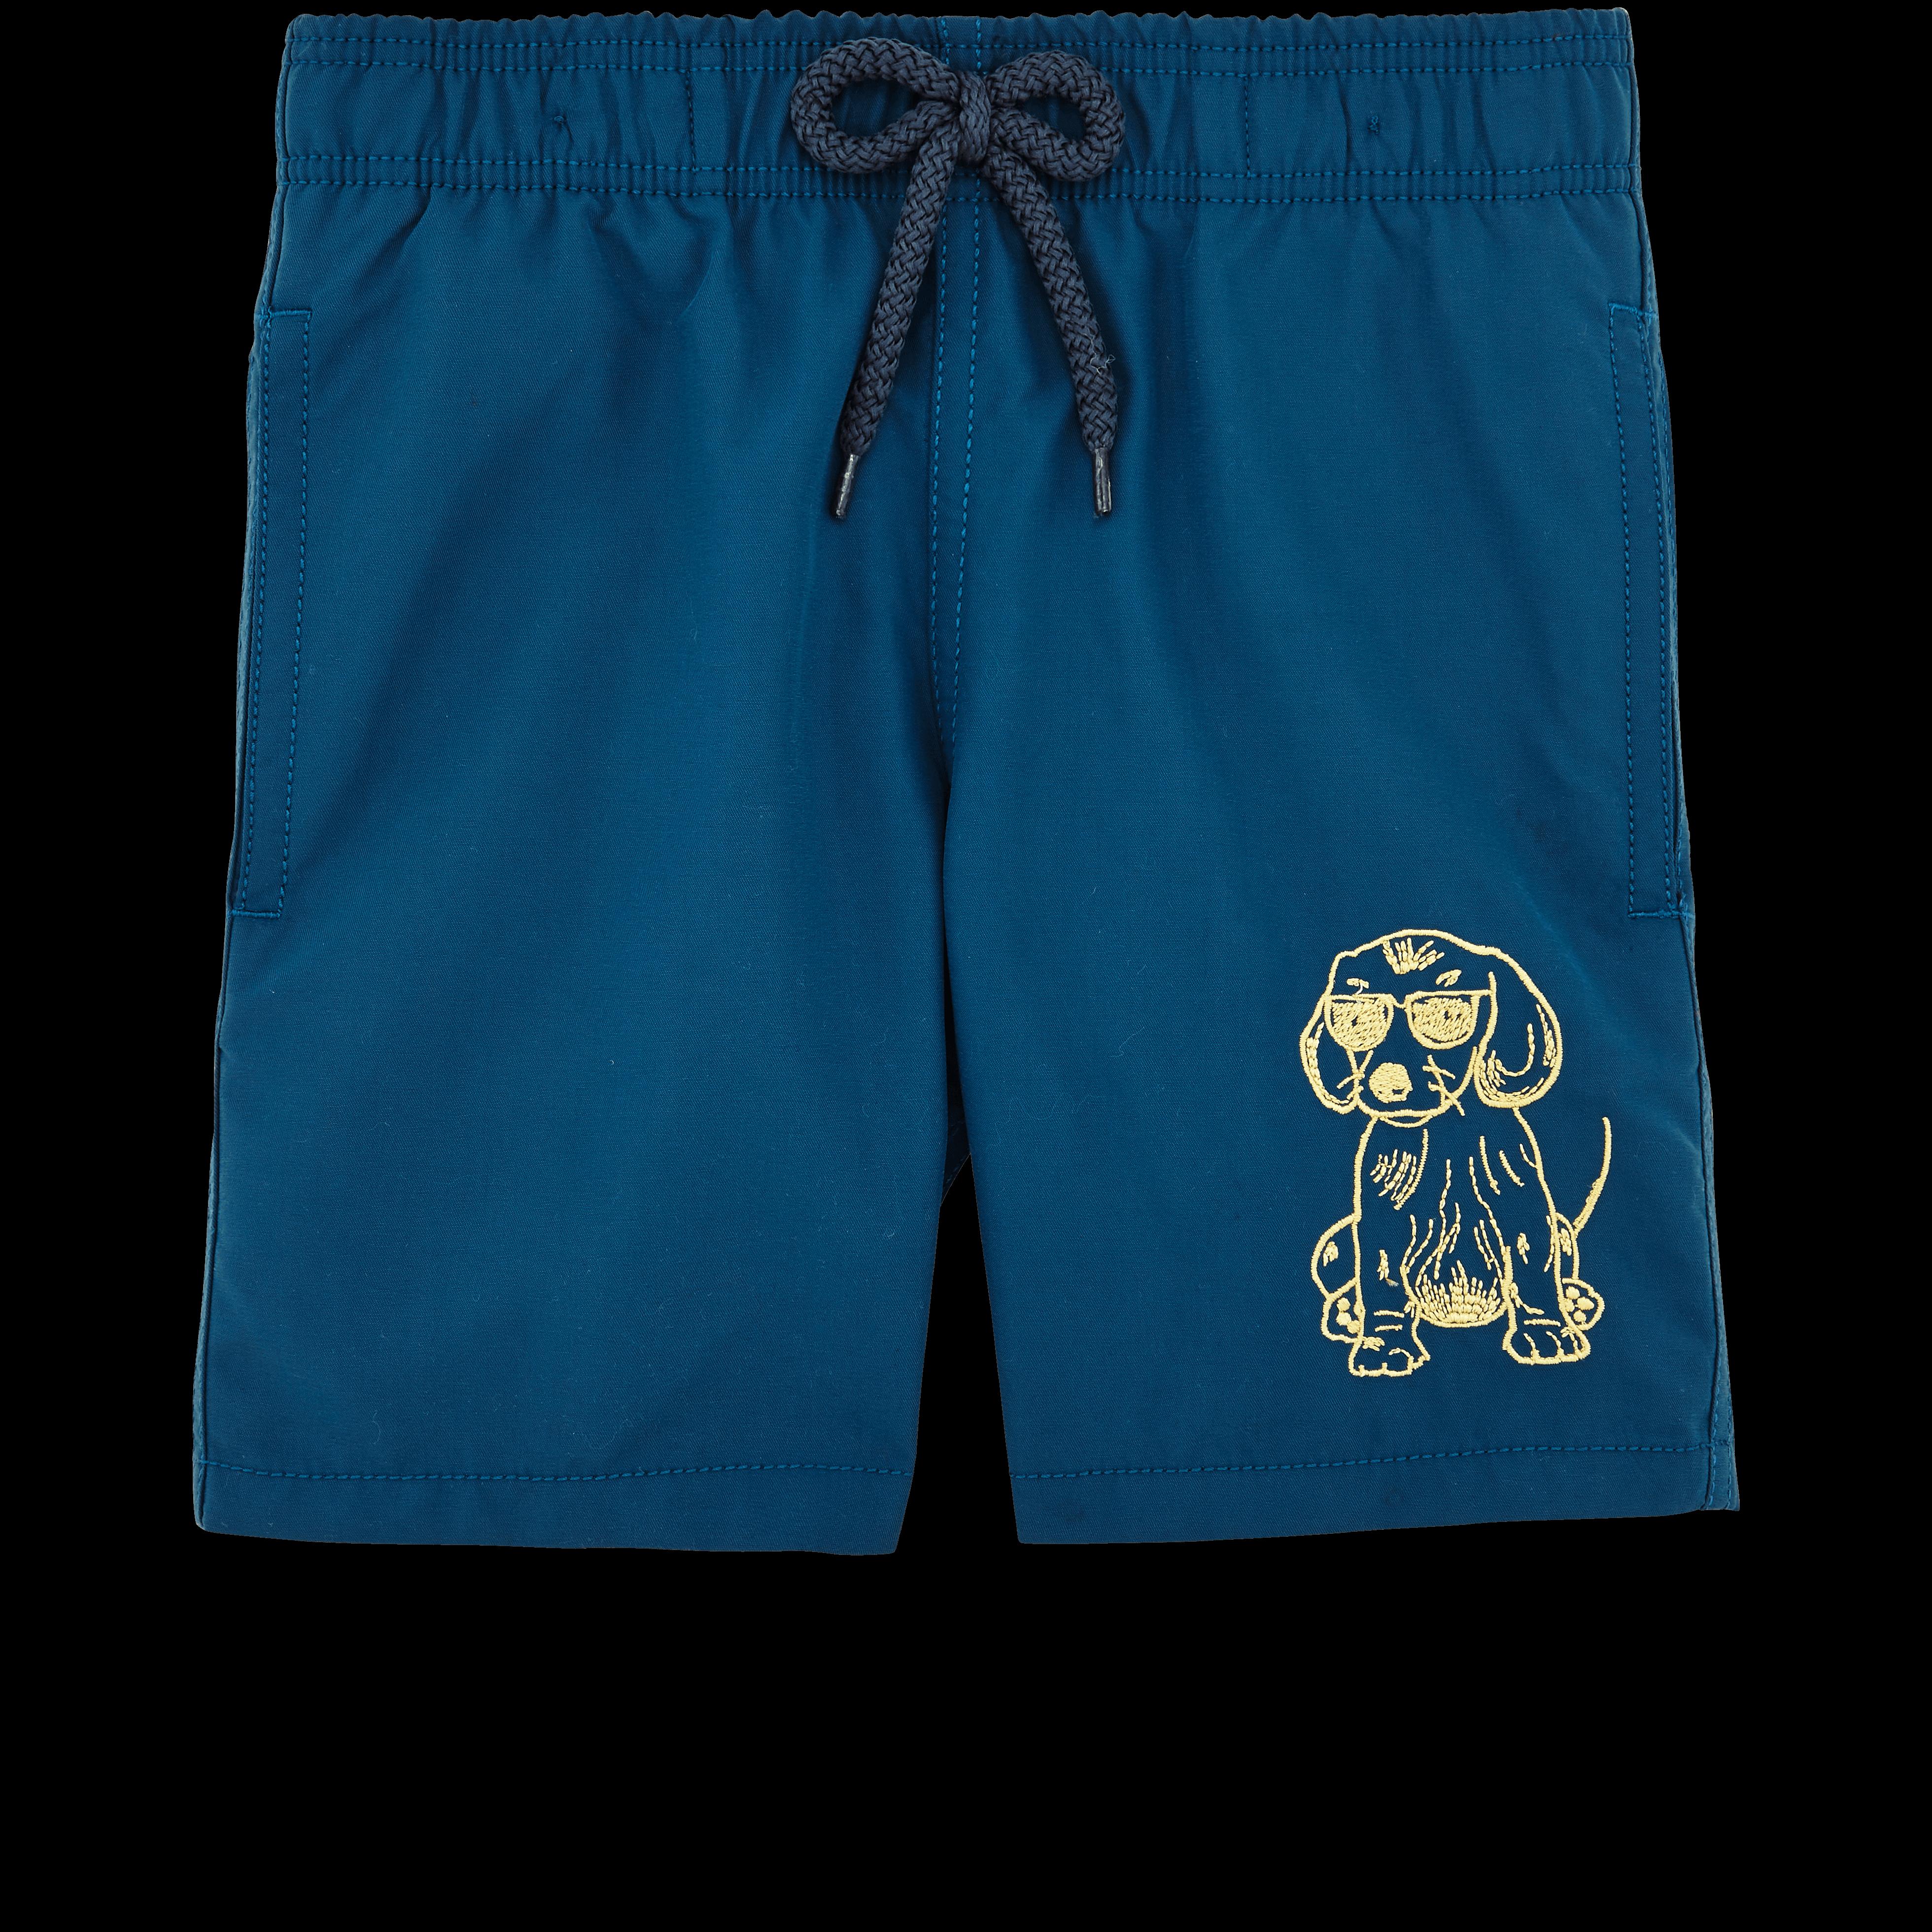 VILEBREQUIN | Boys Swimwear - SUNNY DOG EMBROIDERED SWIMWEAR - SWIMMING TRUNK - JAM - Blue - 12 - Vilebrequin | Goxip